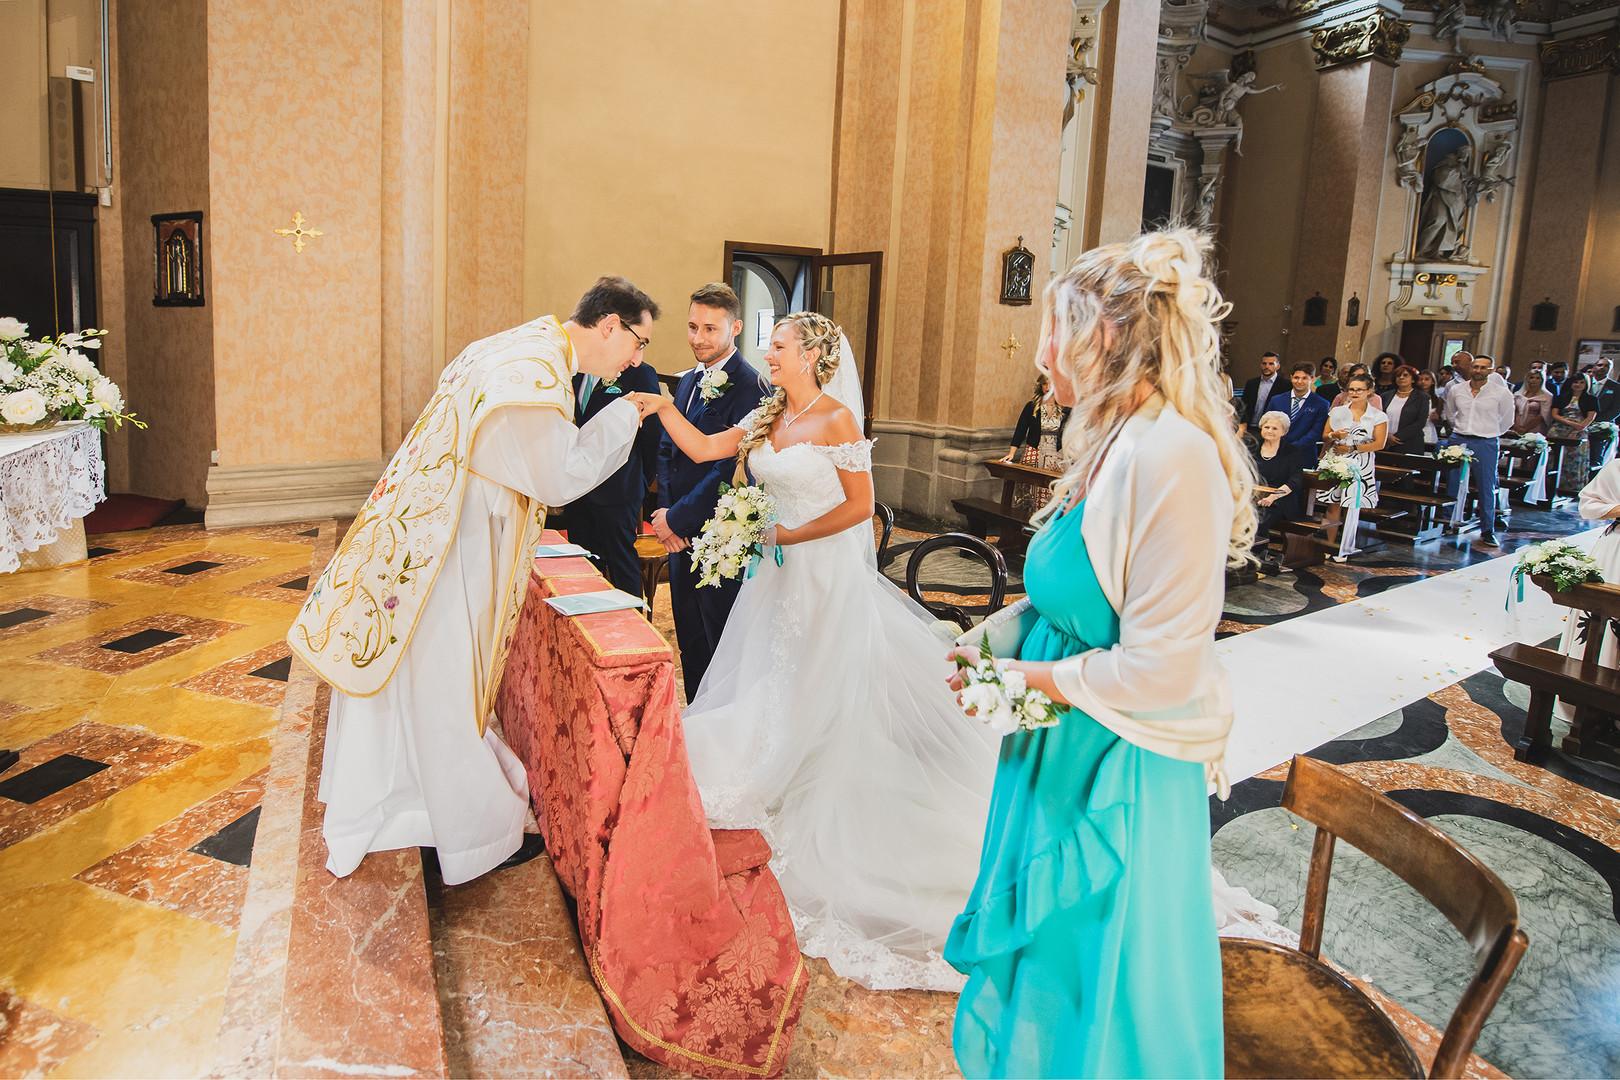 2019.08.24_Matrimonio_Nicole_Davide_0035